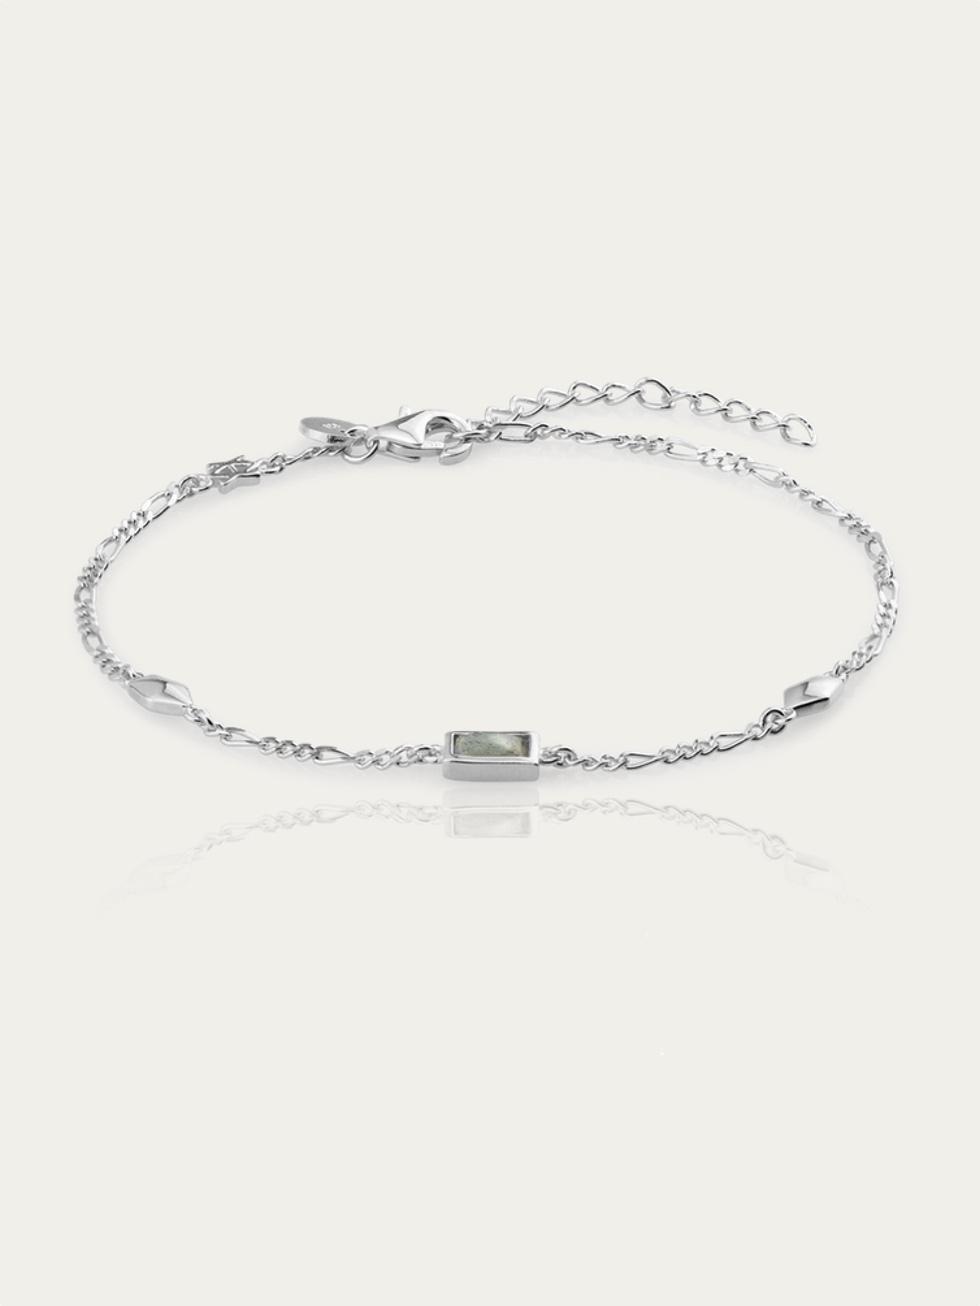 Pulsera nirvana silver 2